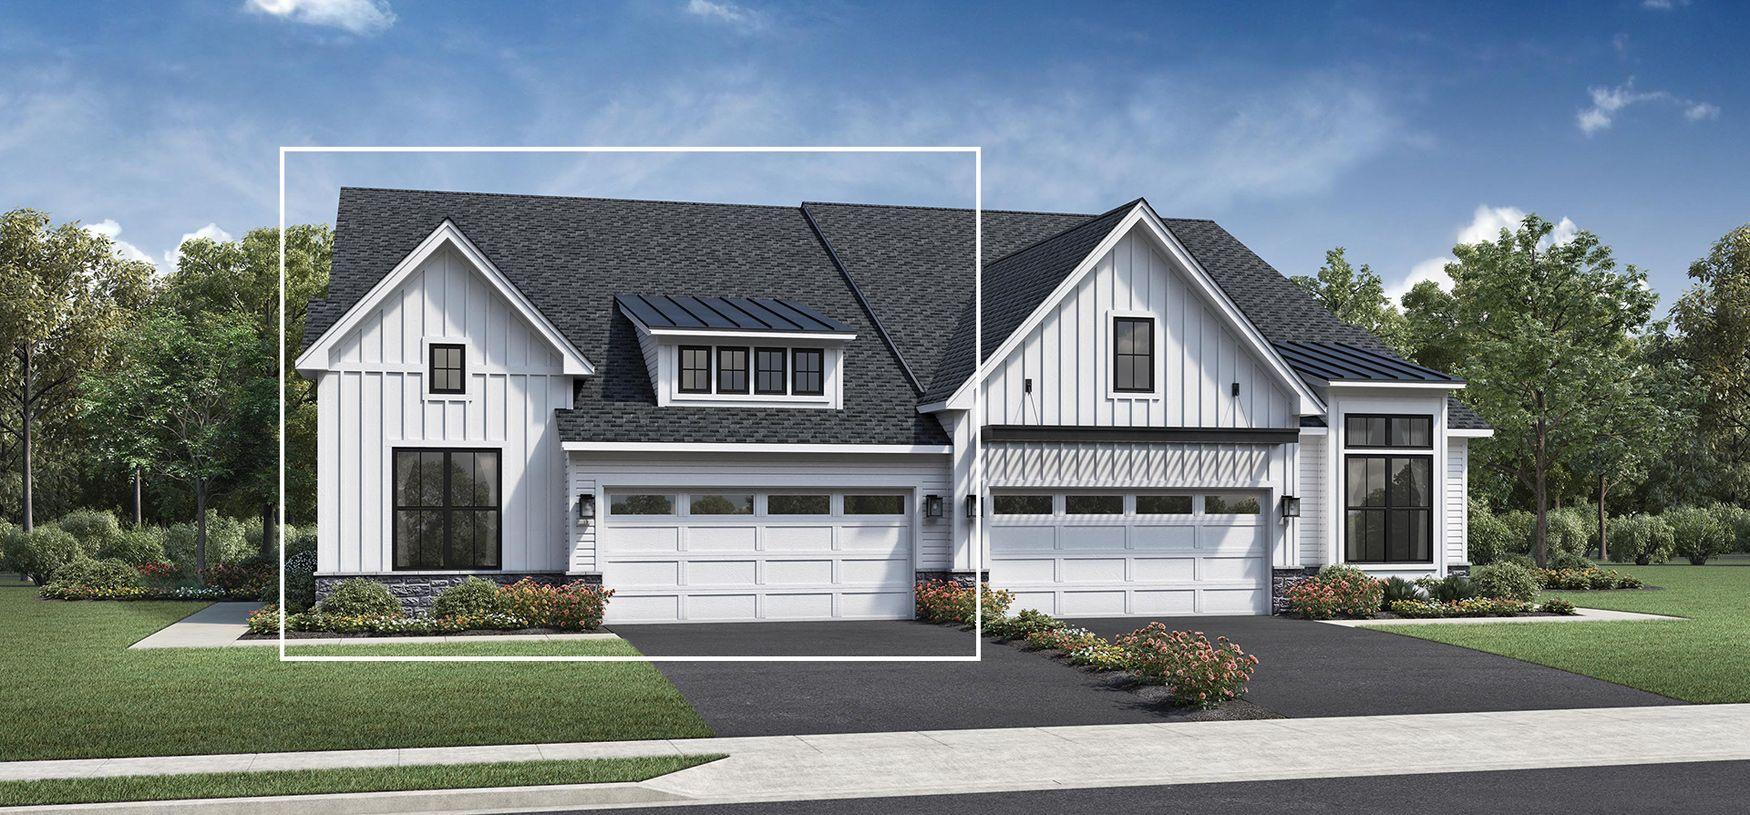 Elevation Image:Modern Farmhouse